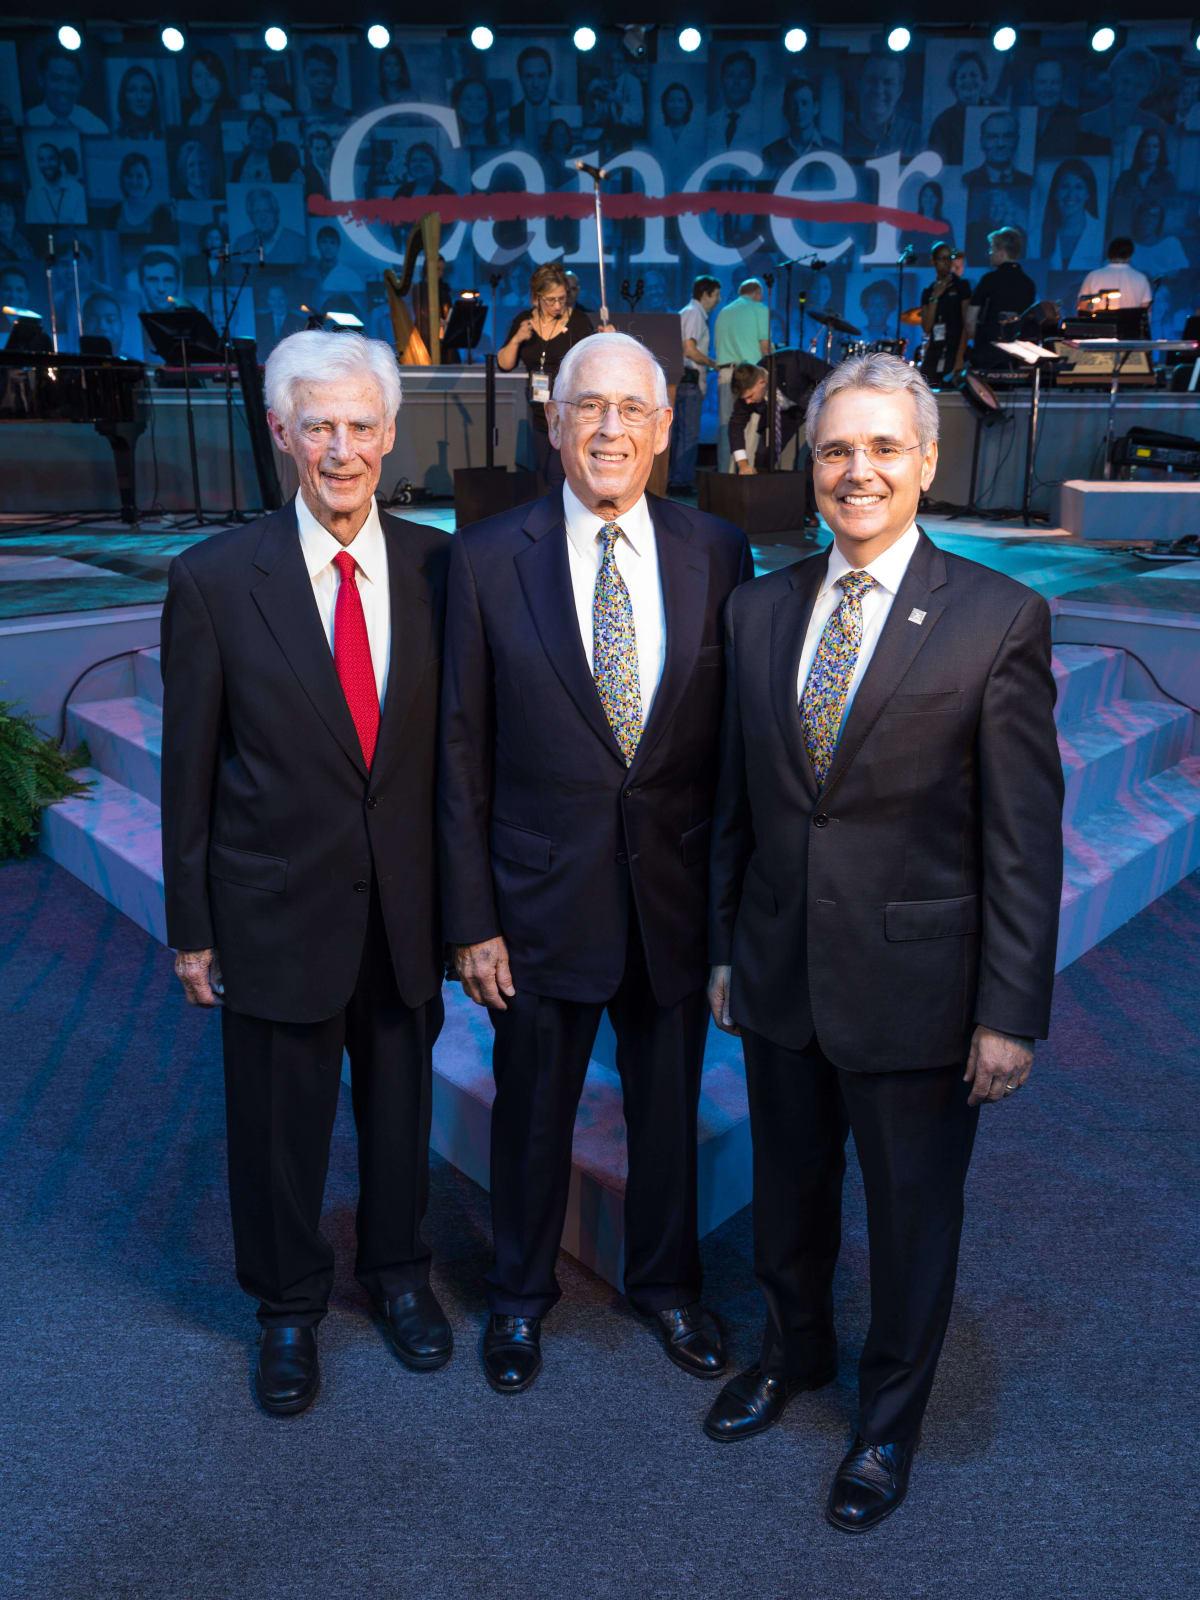 Charles LeMaistre, John Mendelsohn, Ron DePinho at MD Anderson 75th anniversary gala